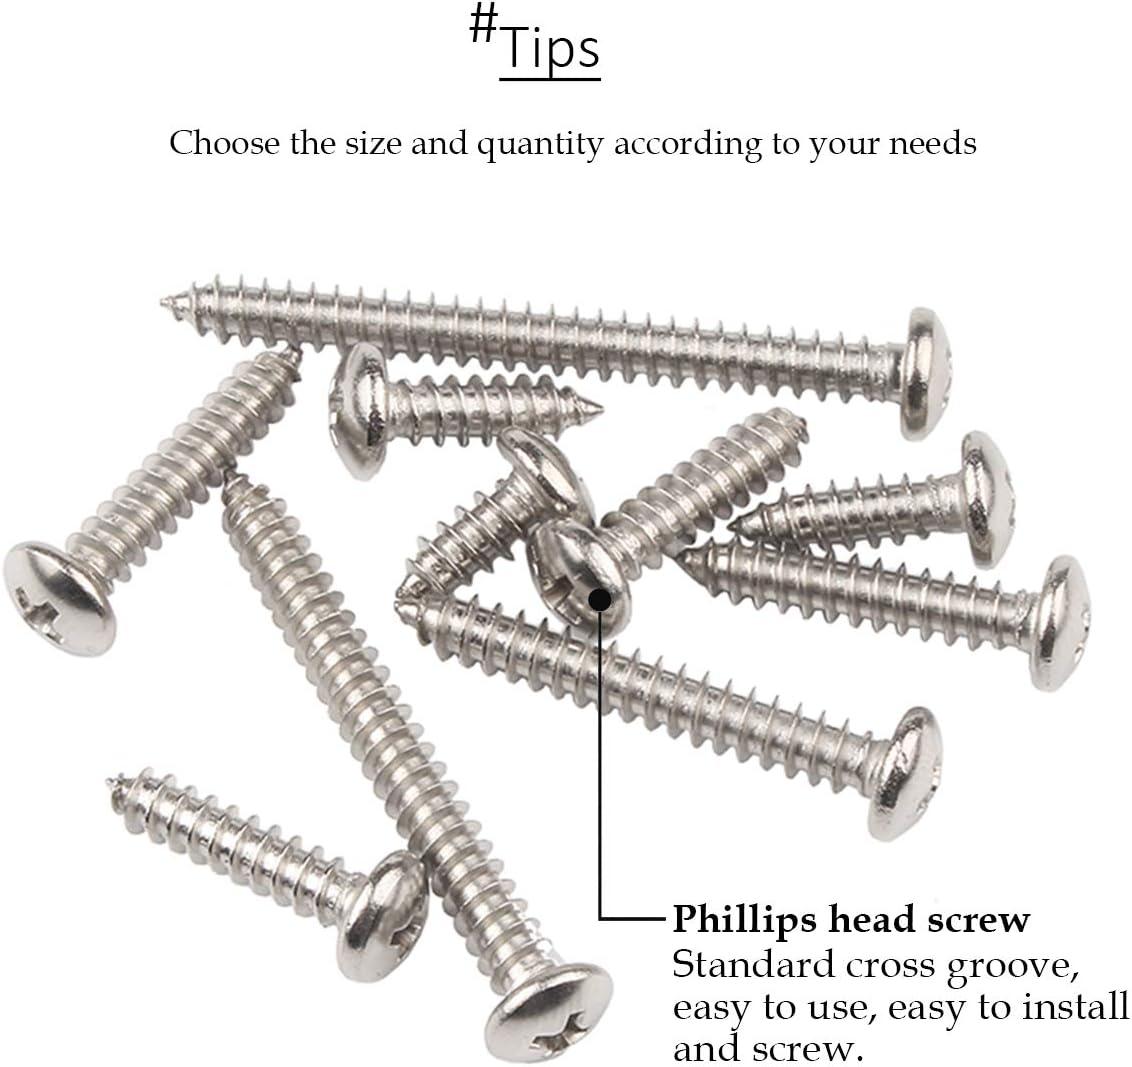 DAZISEN Self Tapping Screws and Phillips Wood Screw Fasteners M4